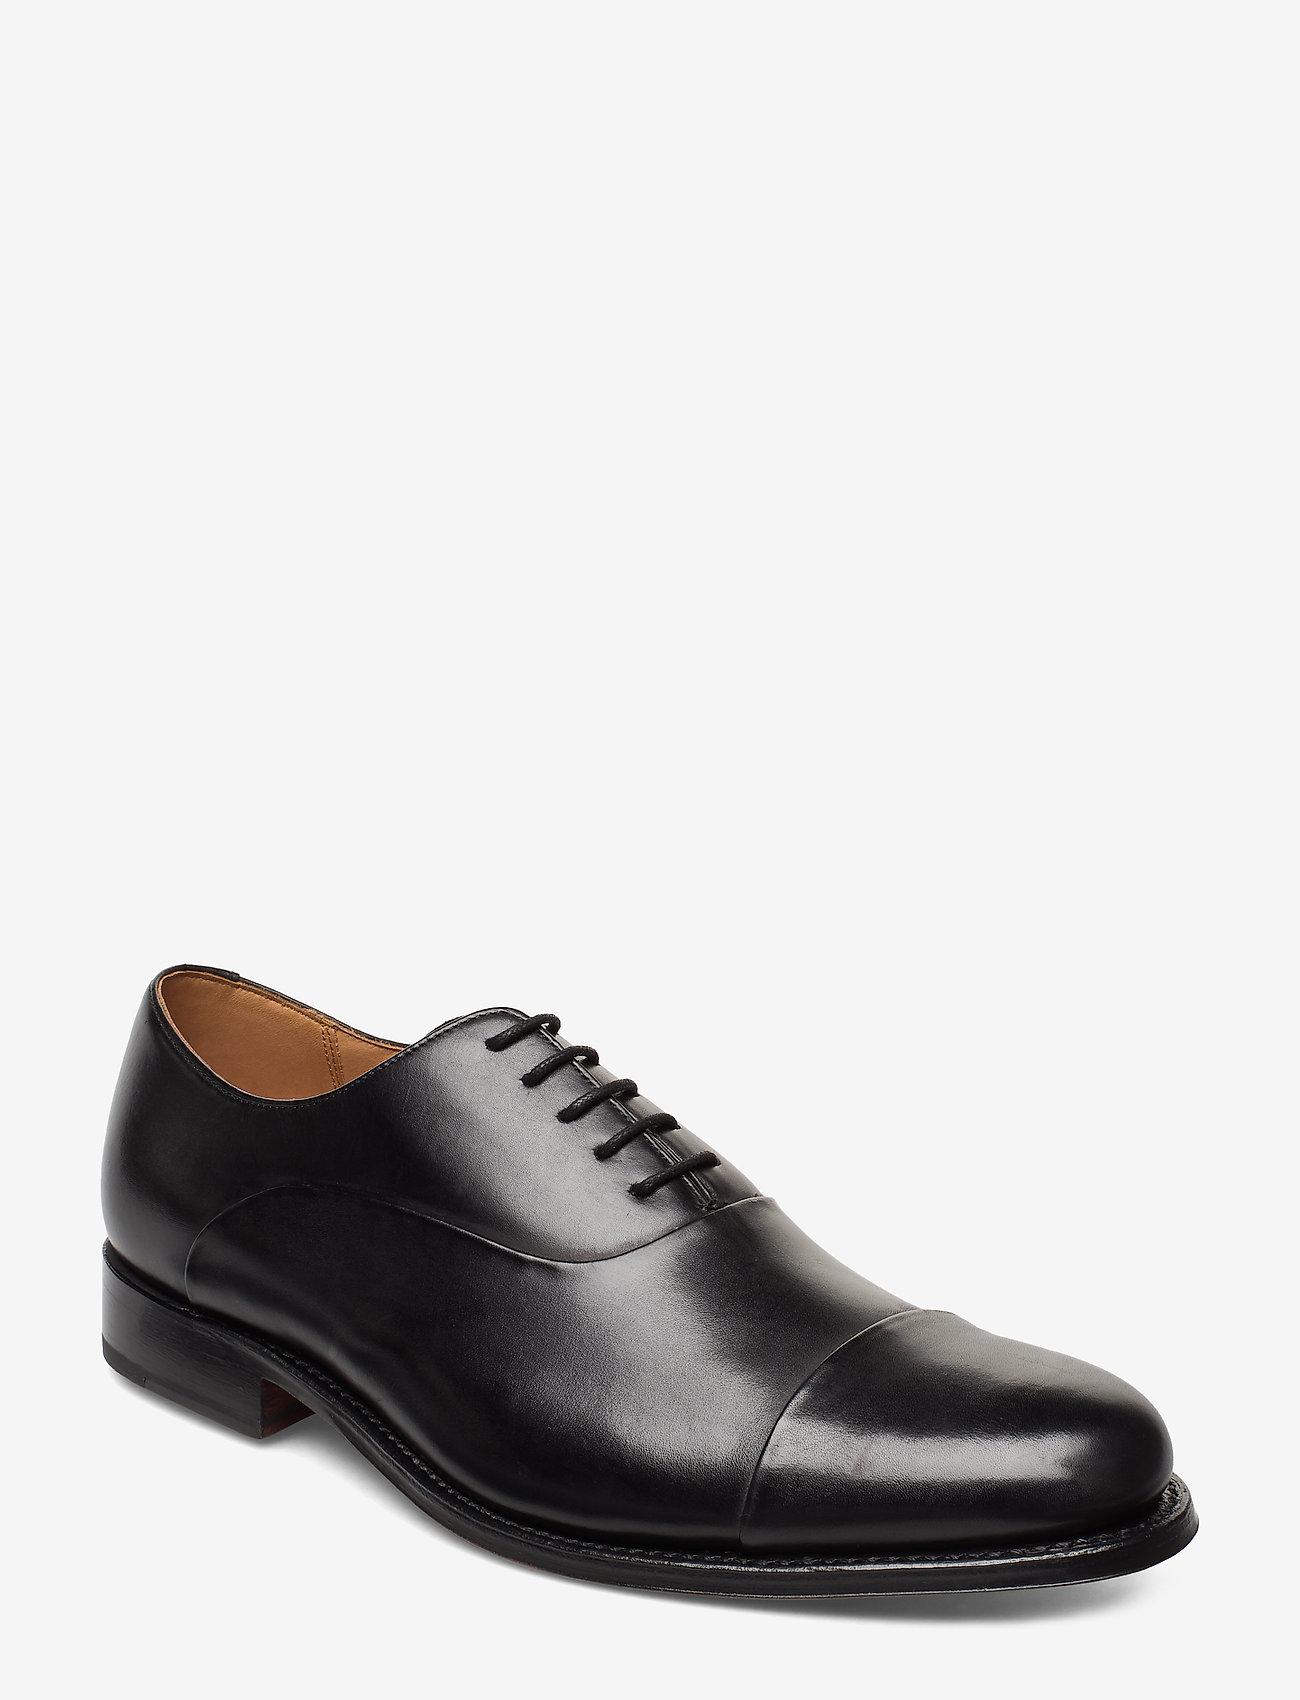 Grenson - BERT - buty ze skóry lakierowanej - black - 0